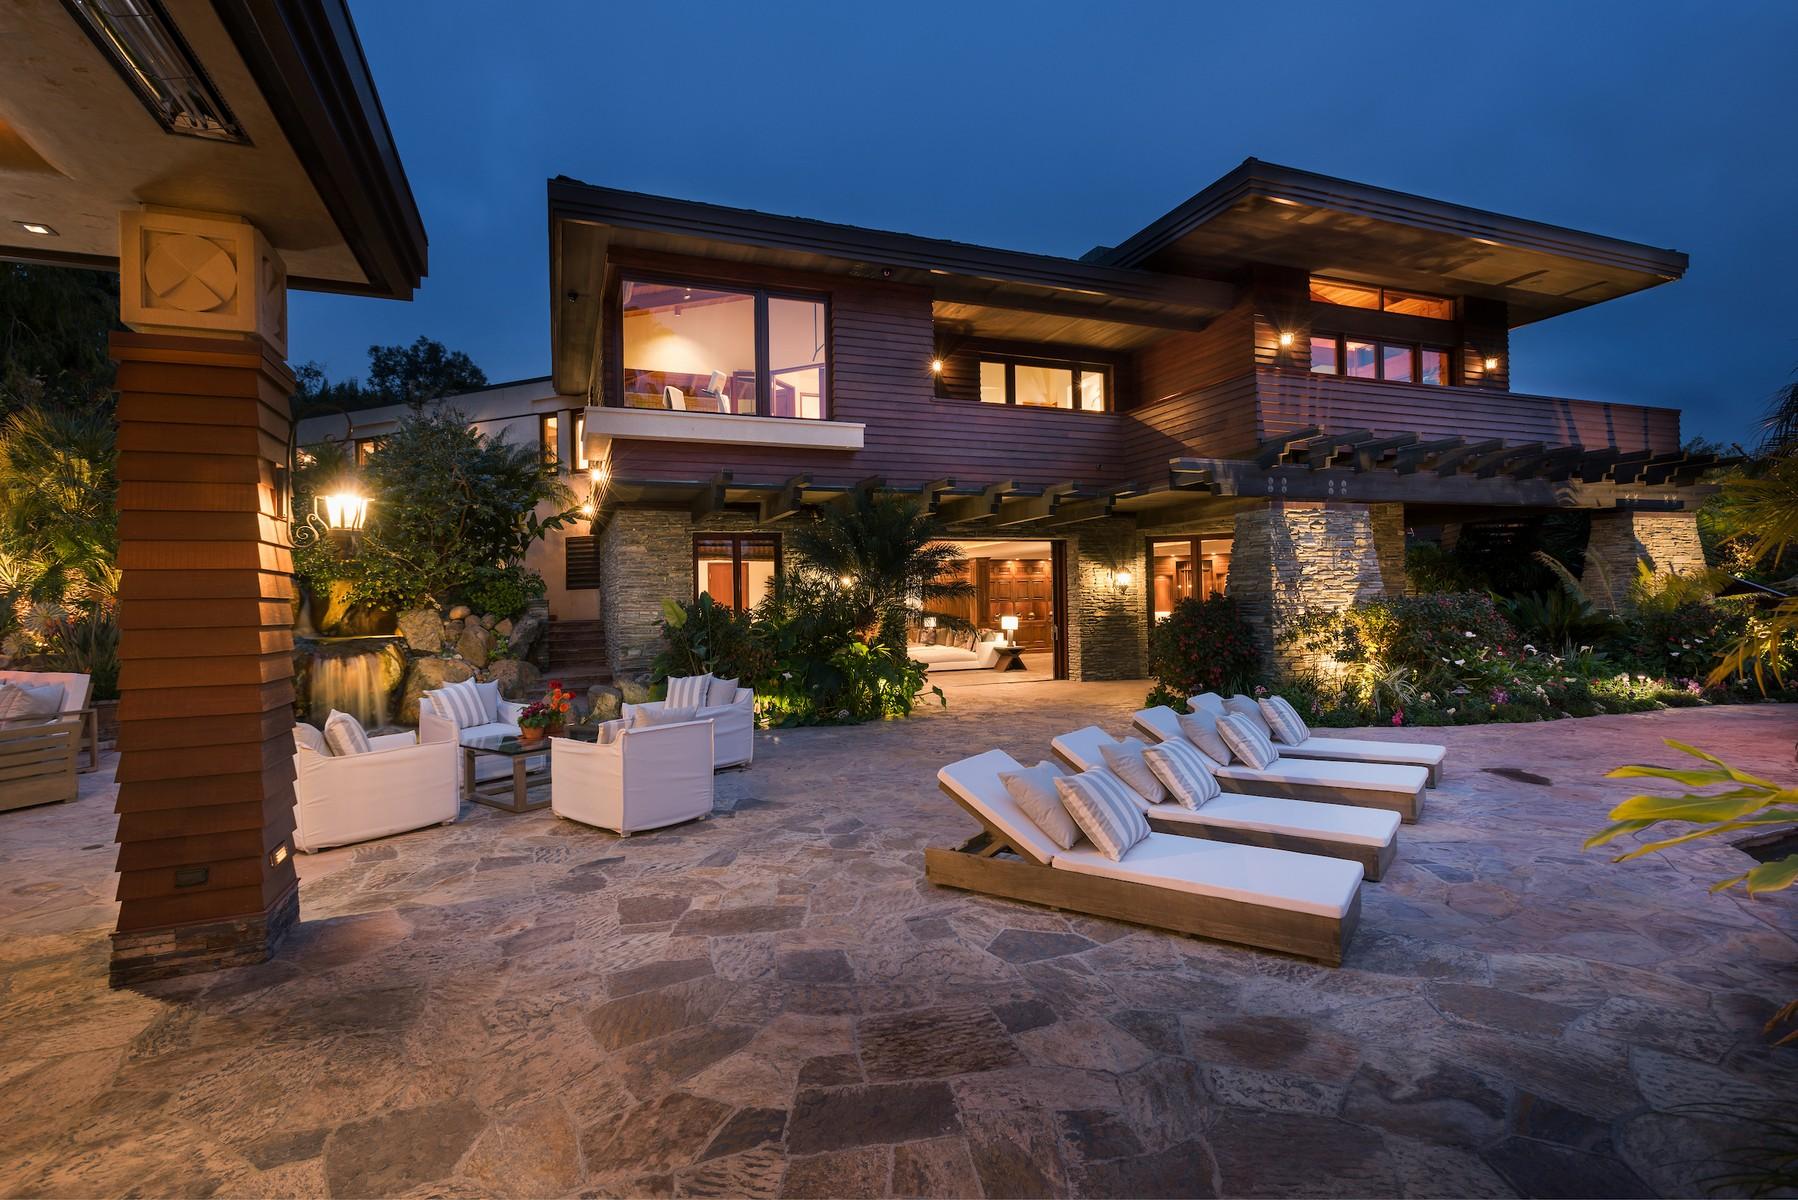 Additional photo for property listing at 4840 El Secreto 4840 El Secreto Rancho Santa Fe, California 92067 United States